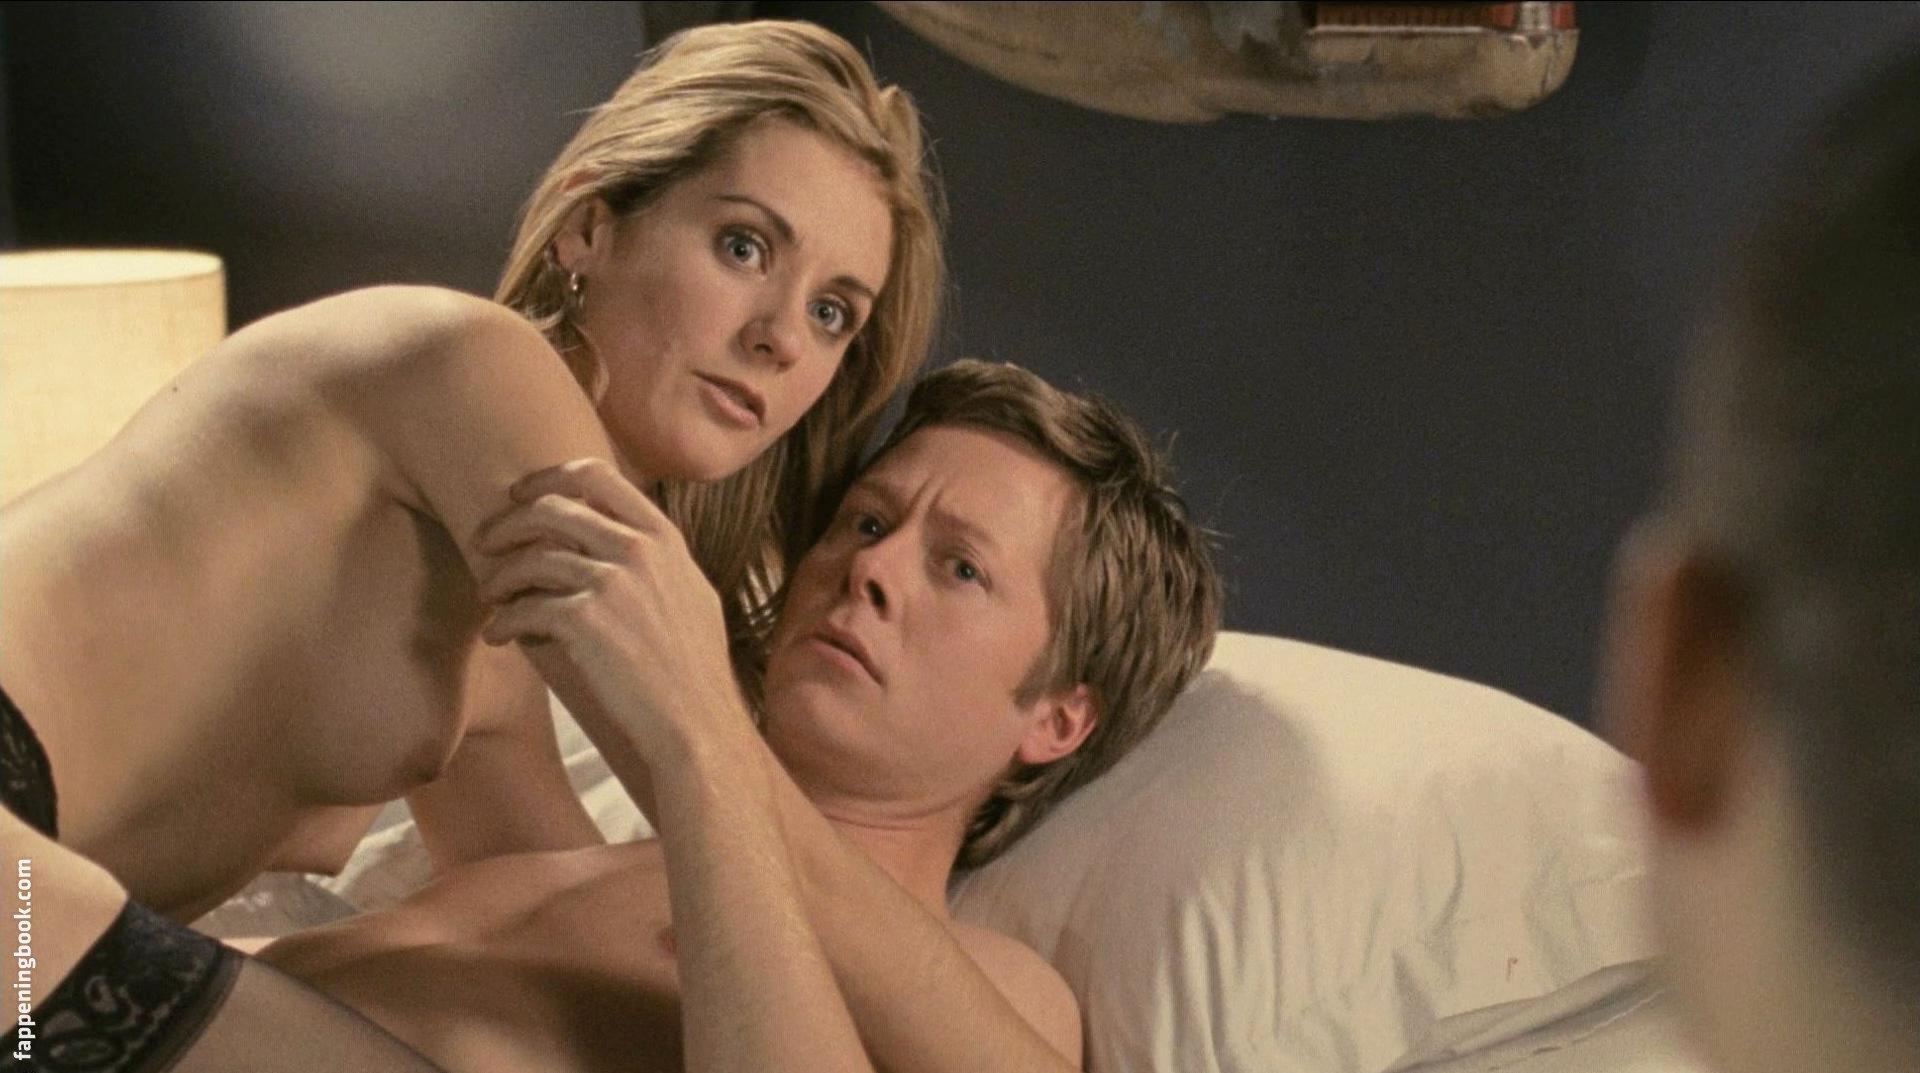 Fiona Vroom Naked natalie lisinska nude, sexy, the fappening, uncensored